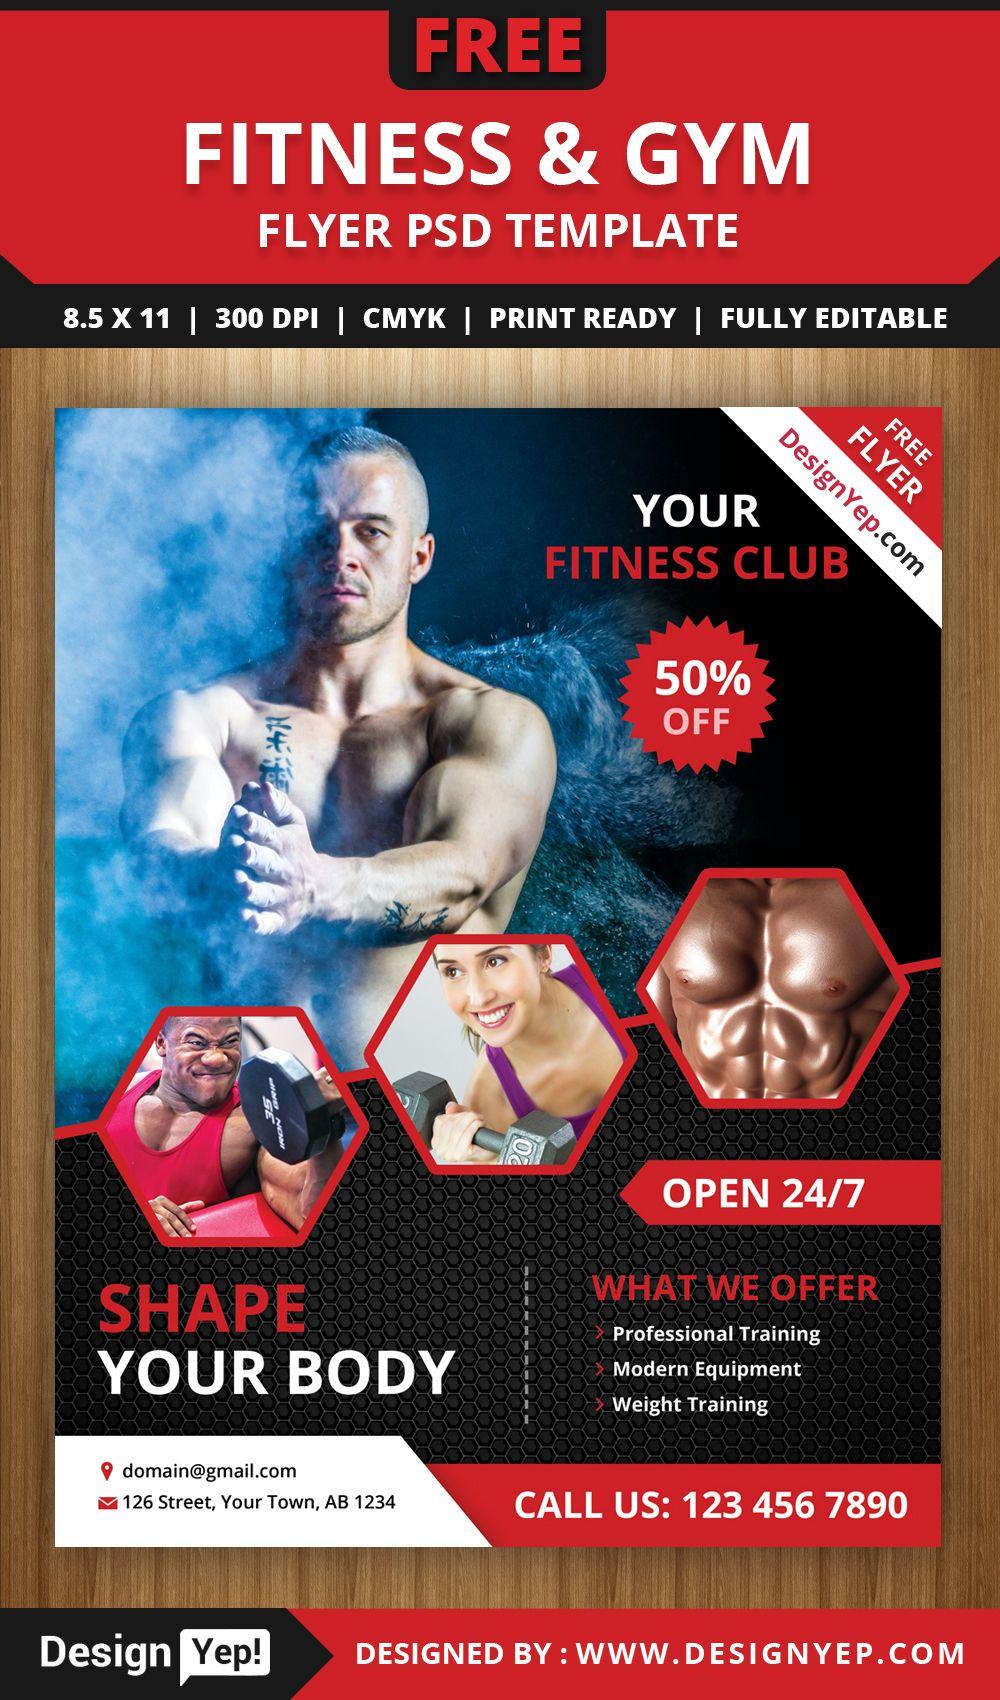 Free Fitness Flyer Templates payroll slip sample verification of – Fitness Templates Free